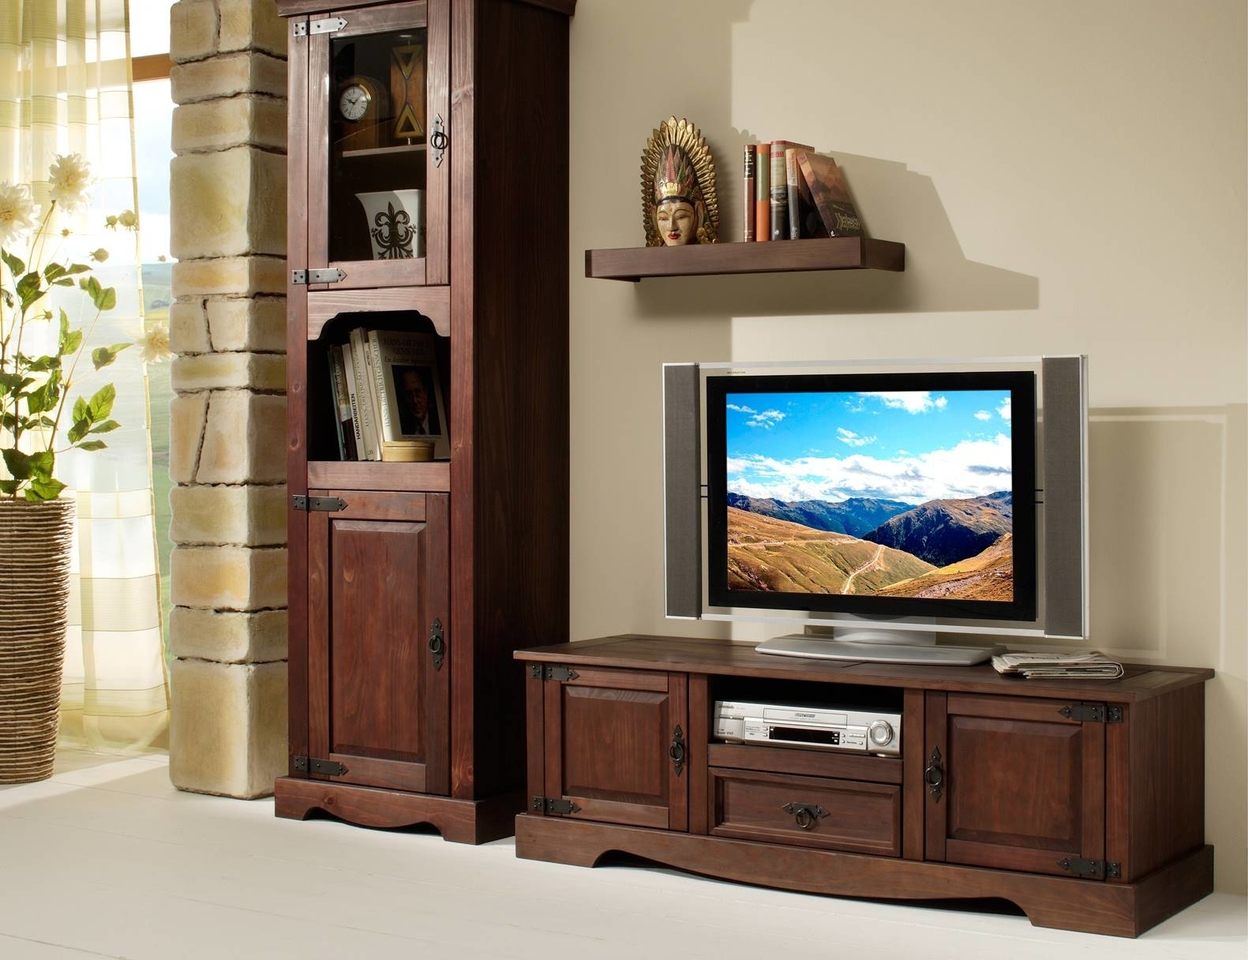 tv board mexican von henke g nstig bestellen bei skanm bler. Black Bedroom Furniture Sets. Home Design Ideas